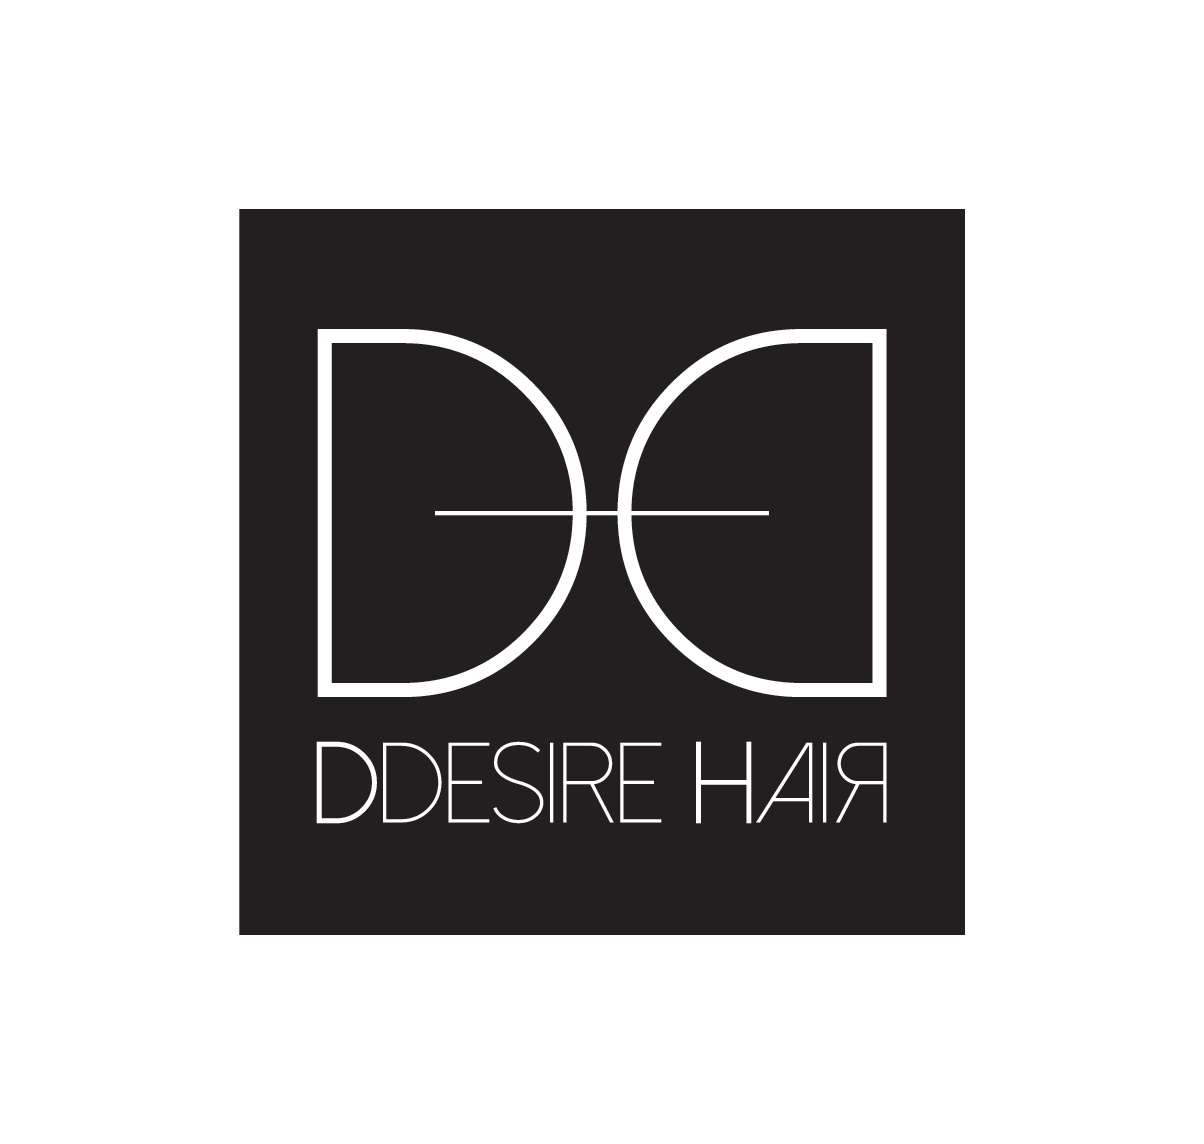 D Desiree HAIR (2016)